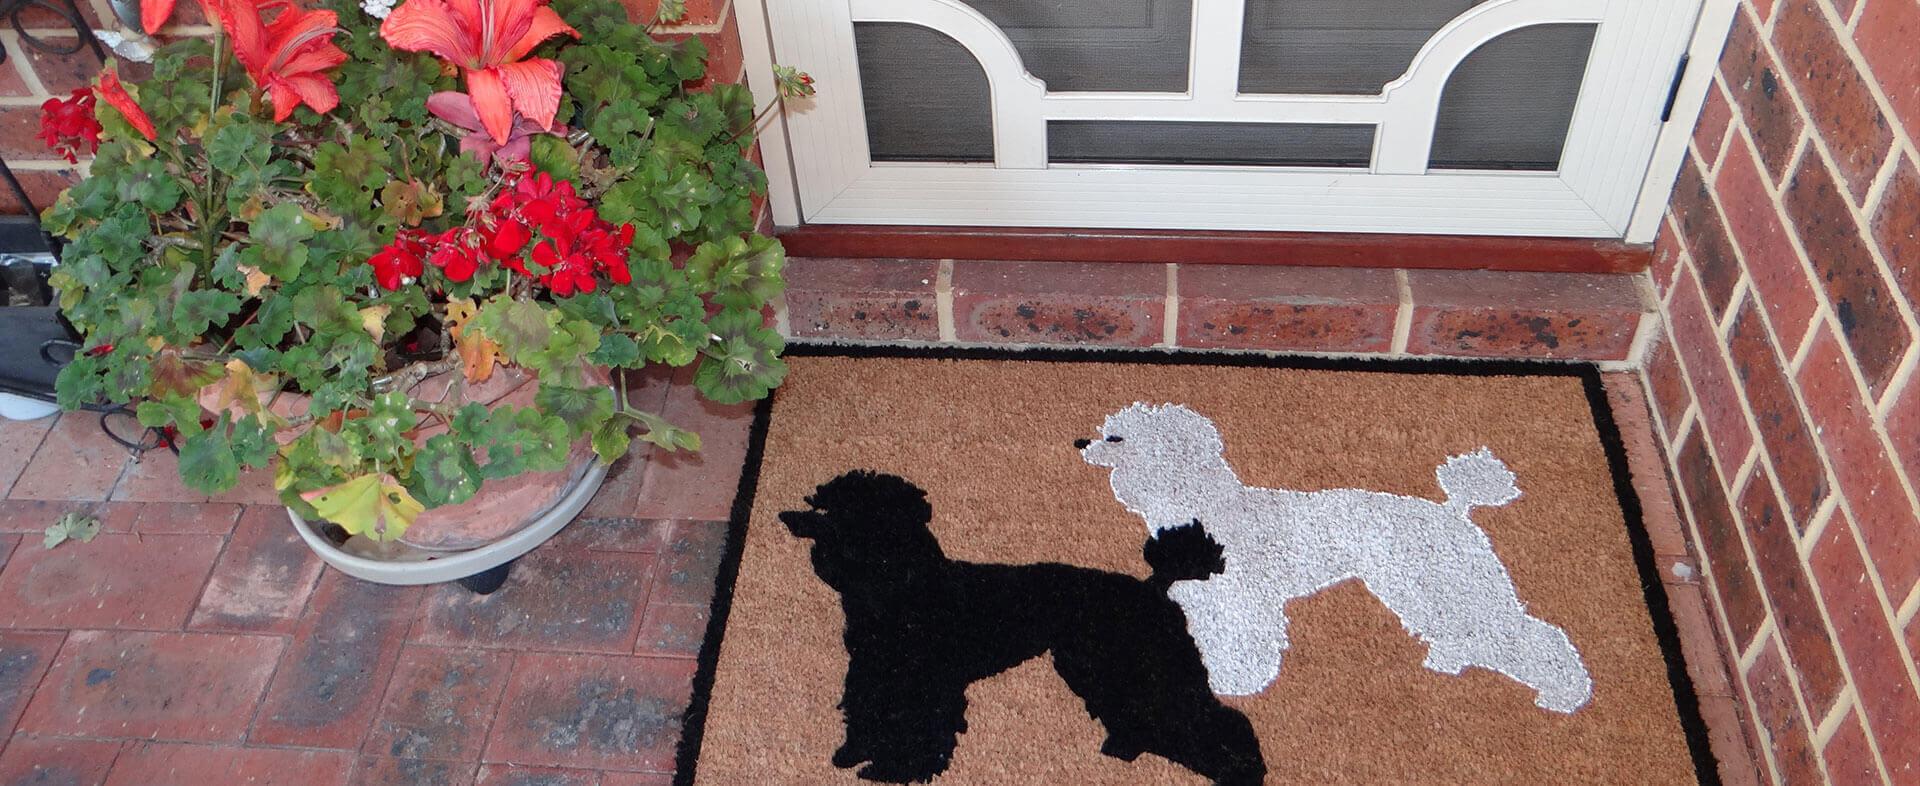 Custom Hand Painted Doormats Perth | Locally Designed - Doormat Art